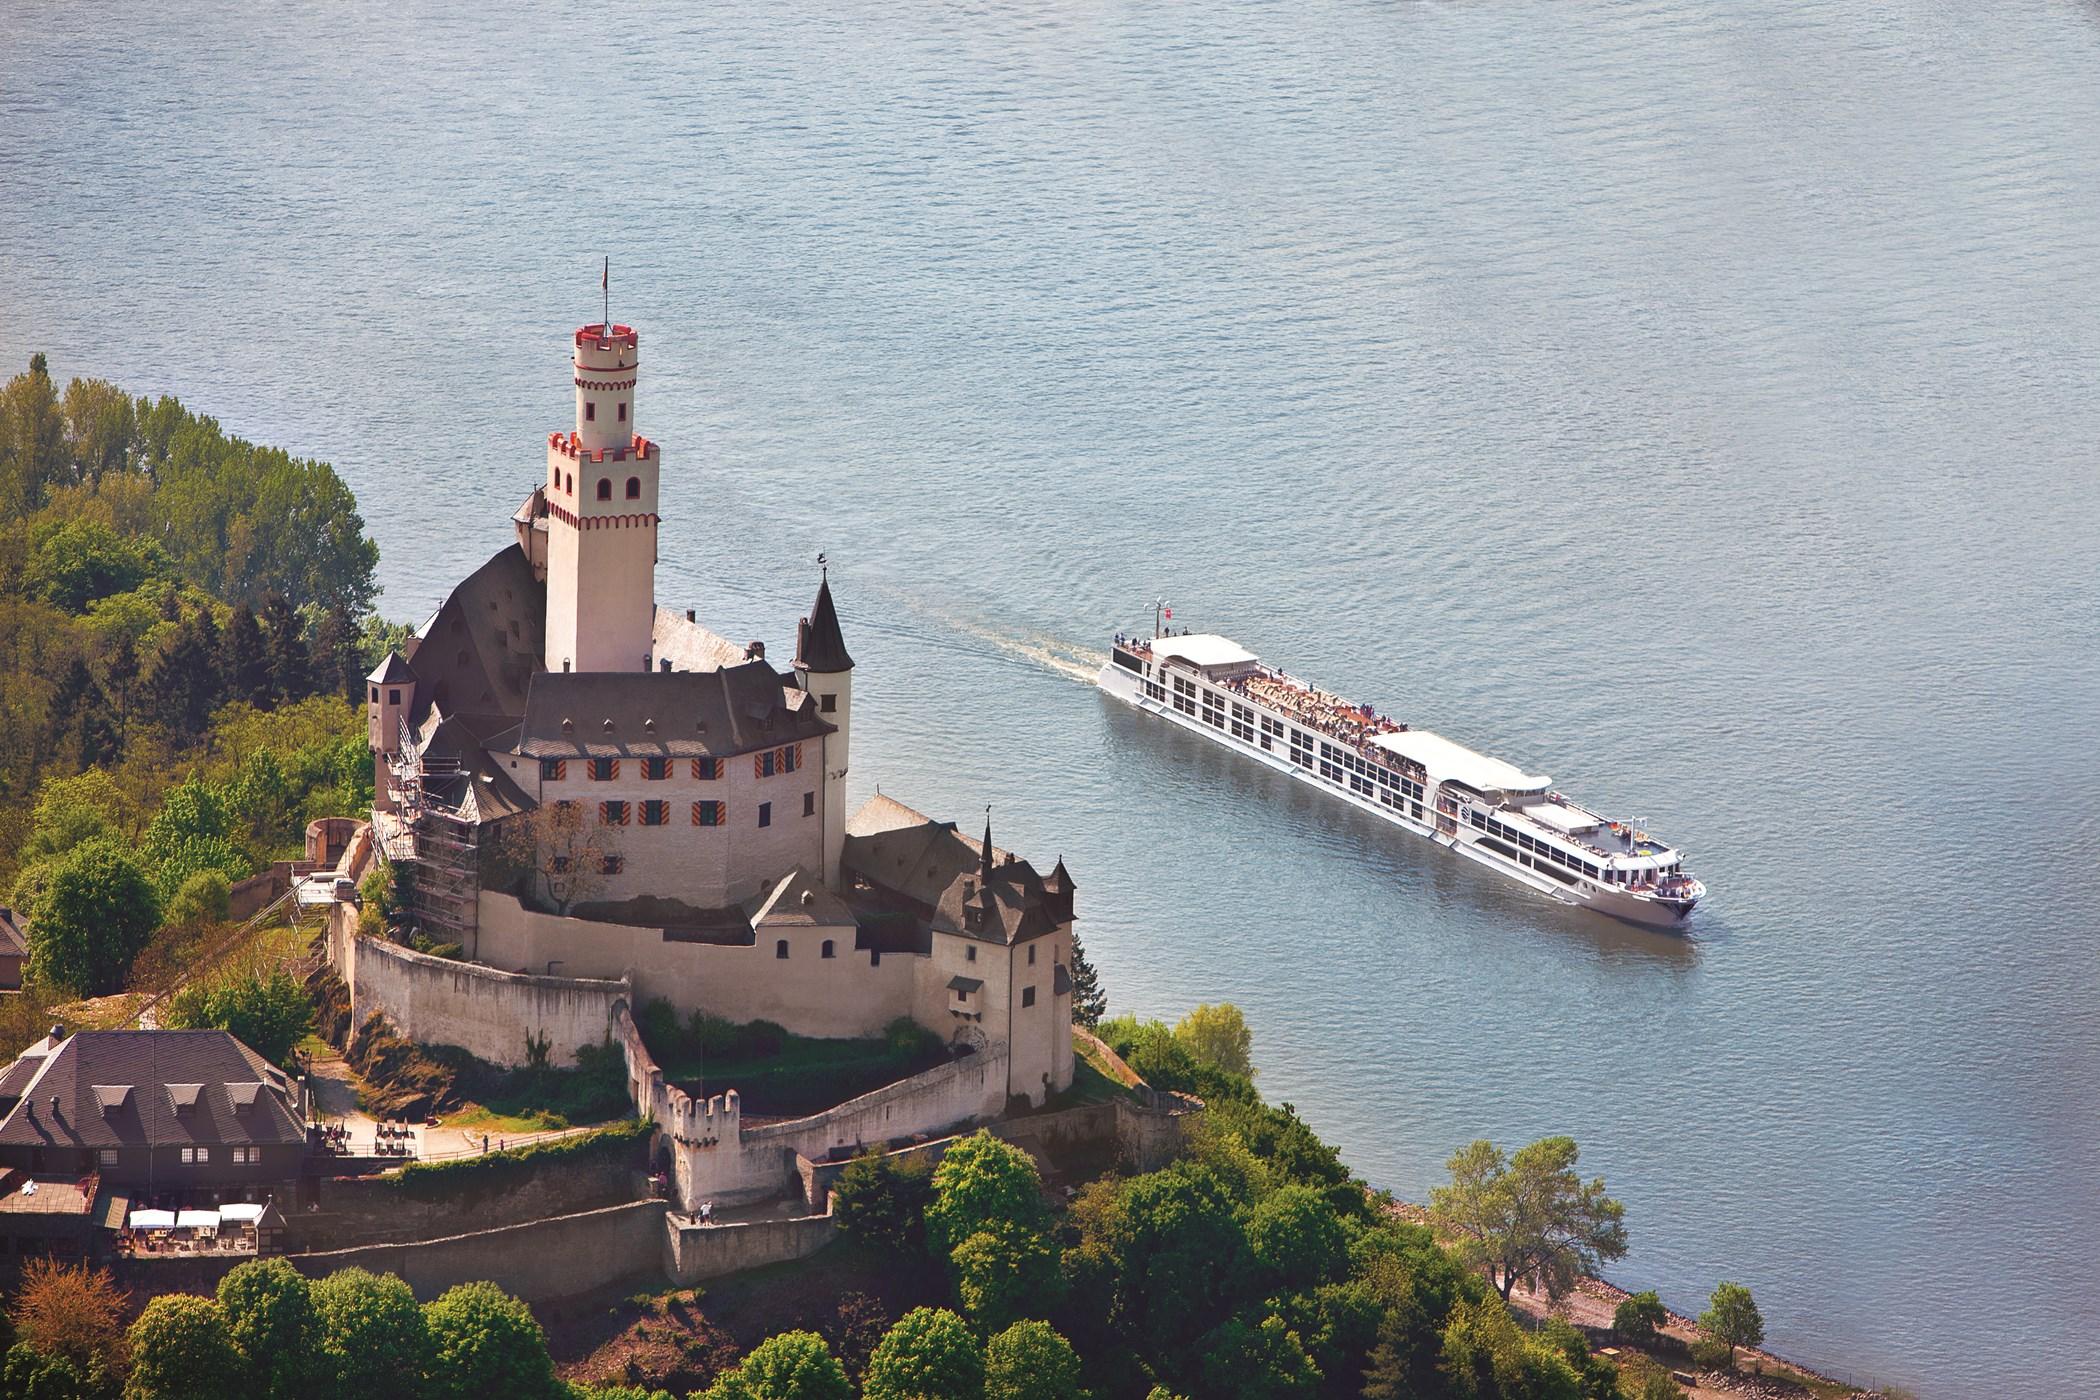 Uniworld Rhine River Cruise.jpg